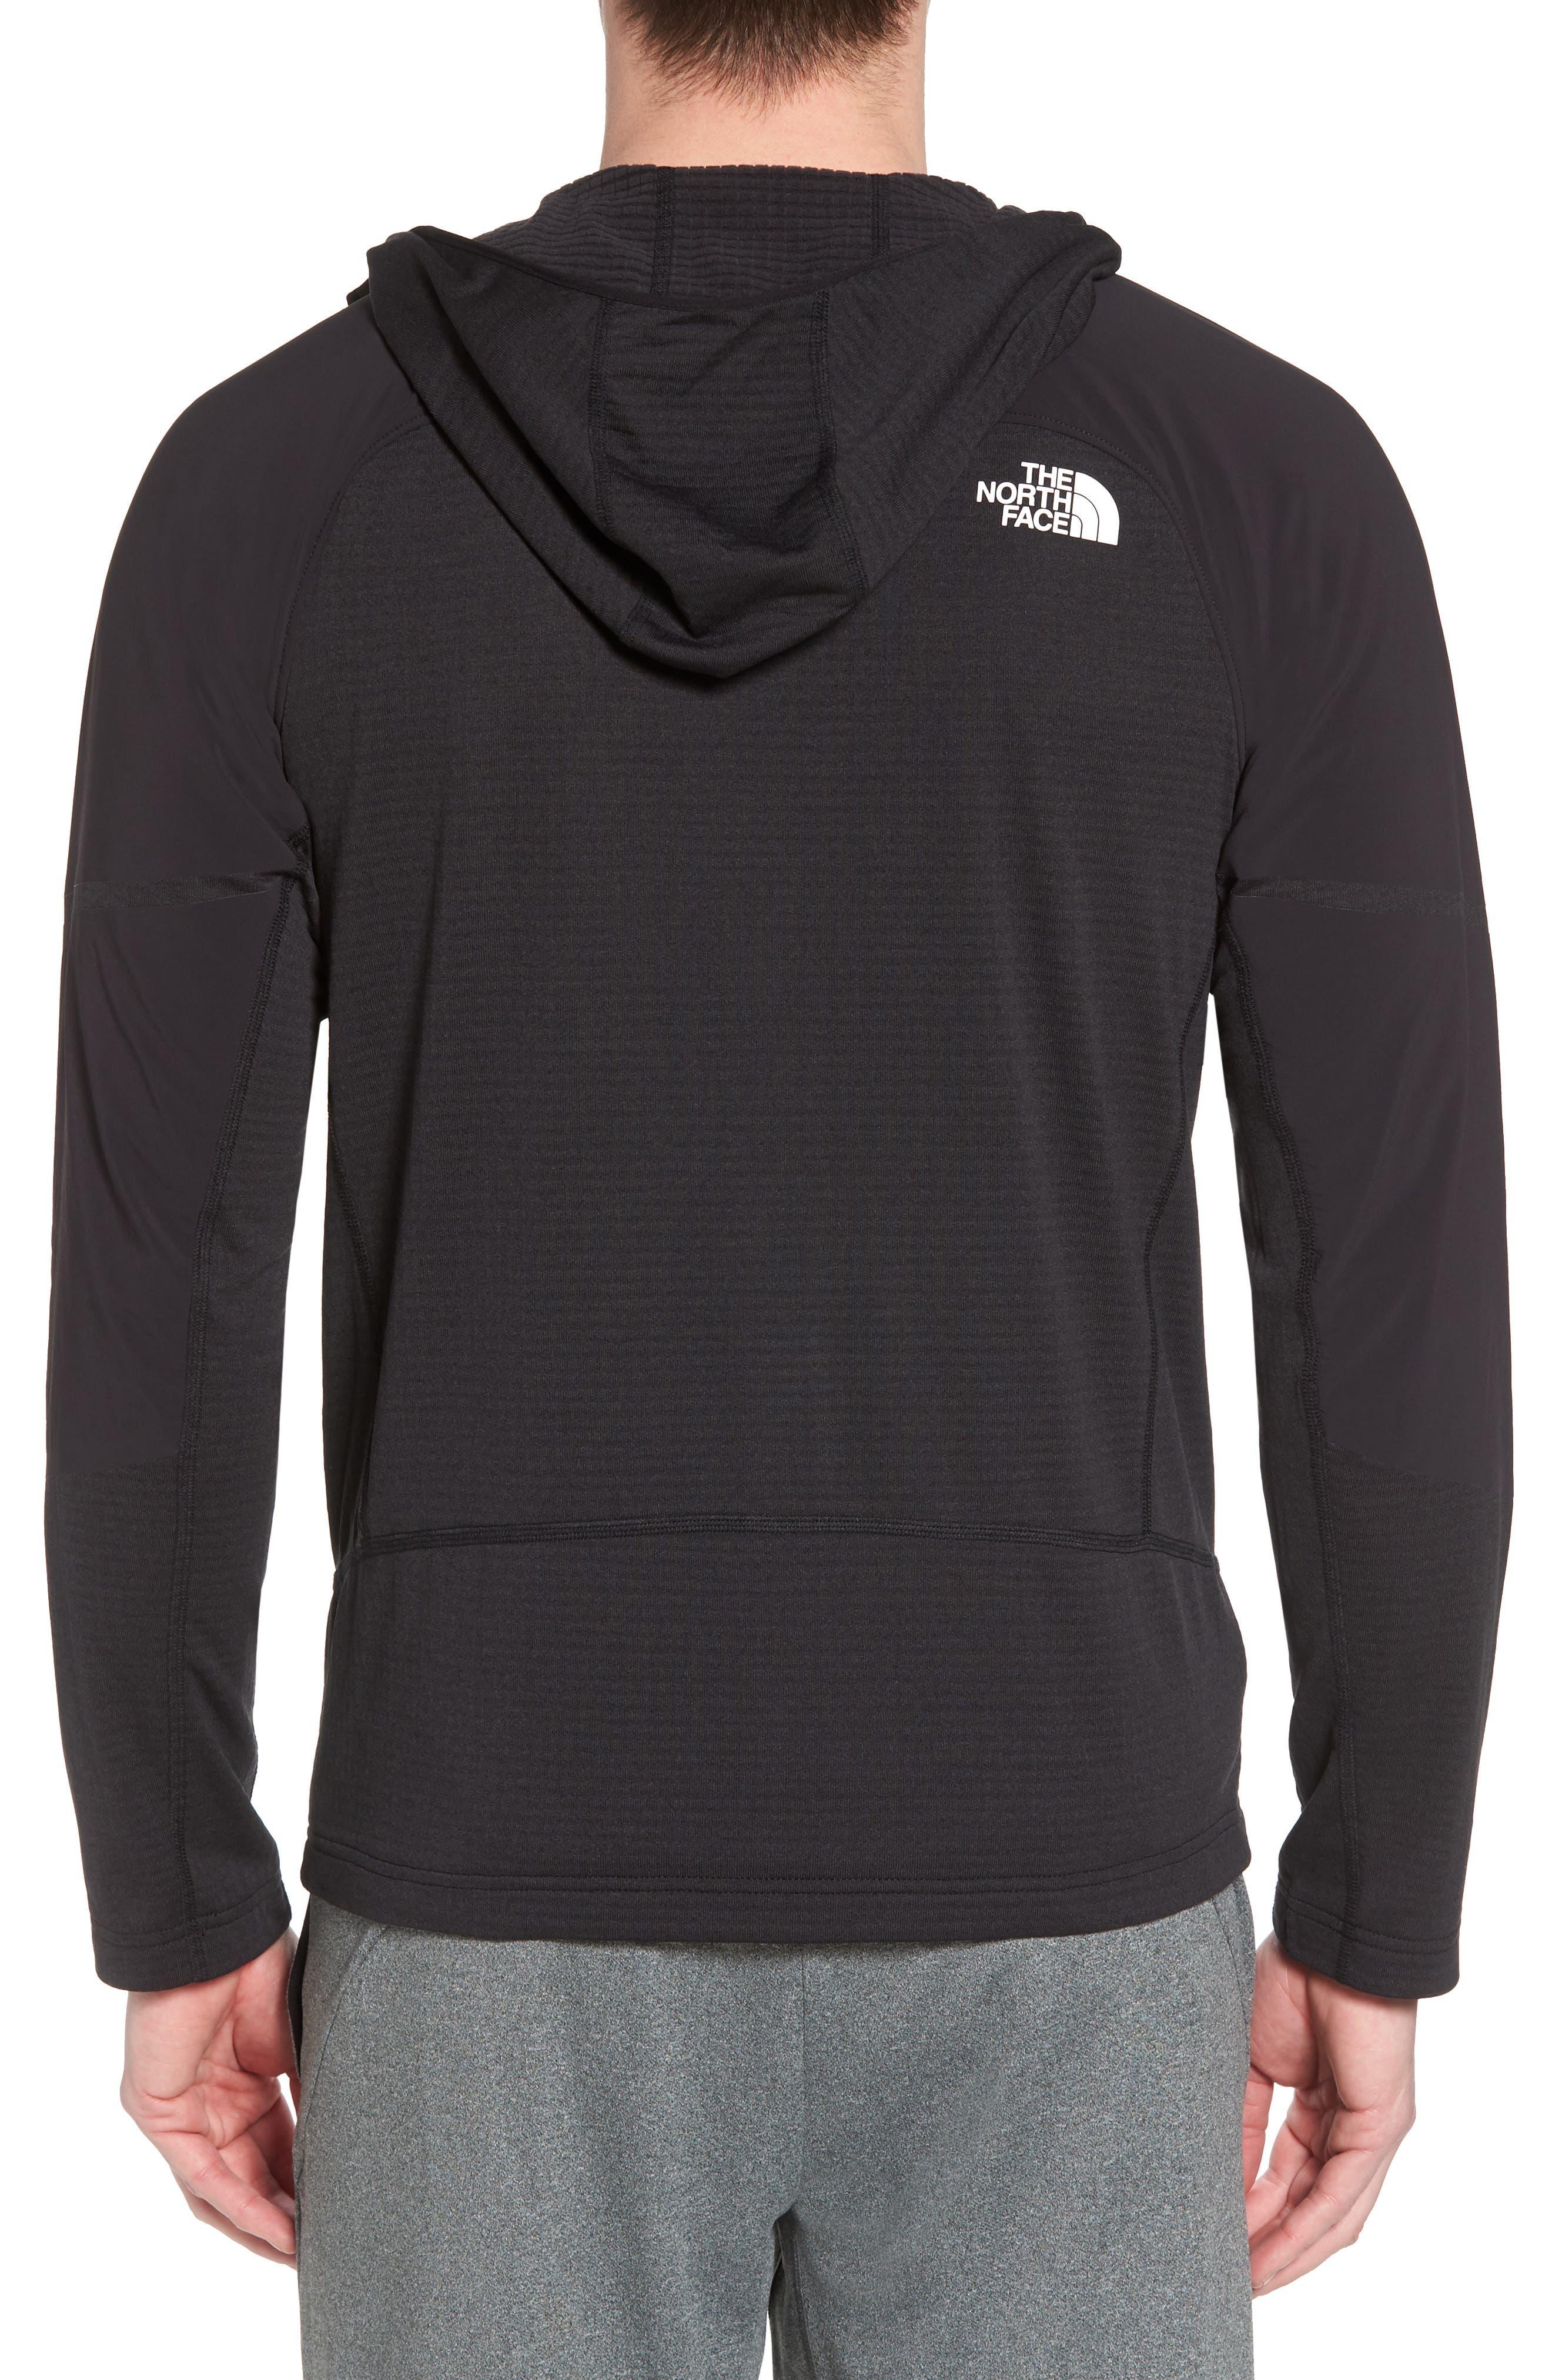 Progressor Power Grid<sup>™</sup> Hooded Fleece Jacket,                             Alternate thumbnail 2, color,                             Black/ Black